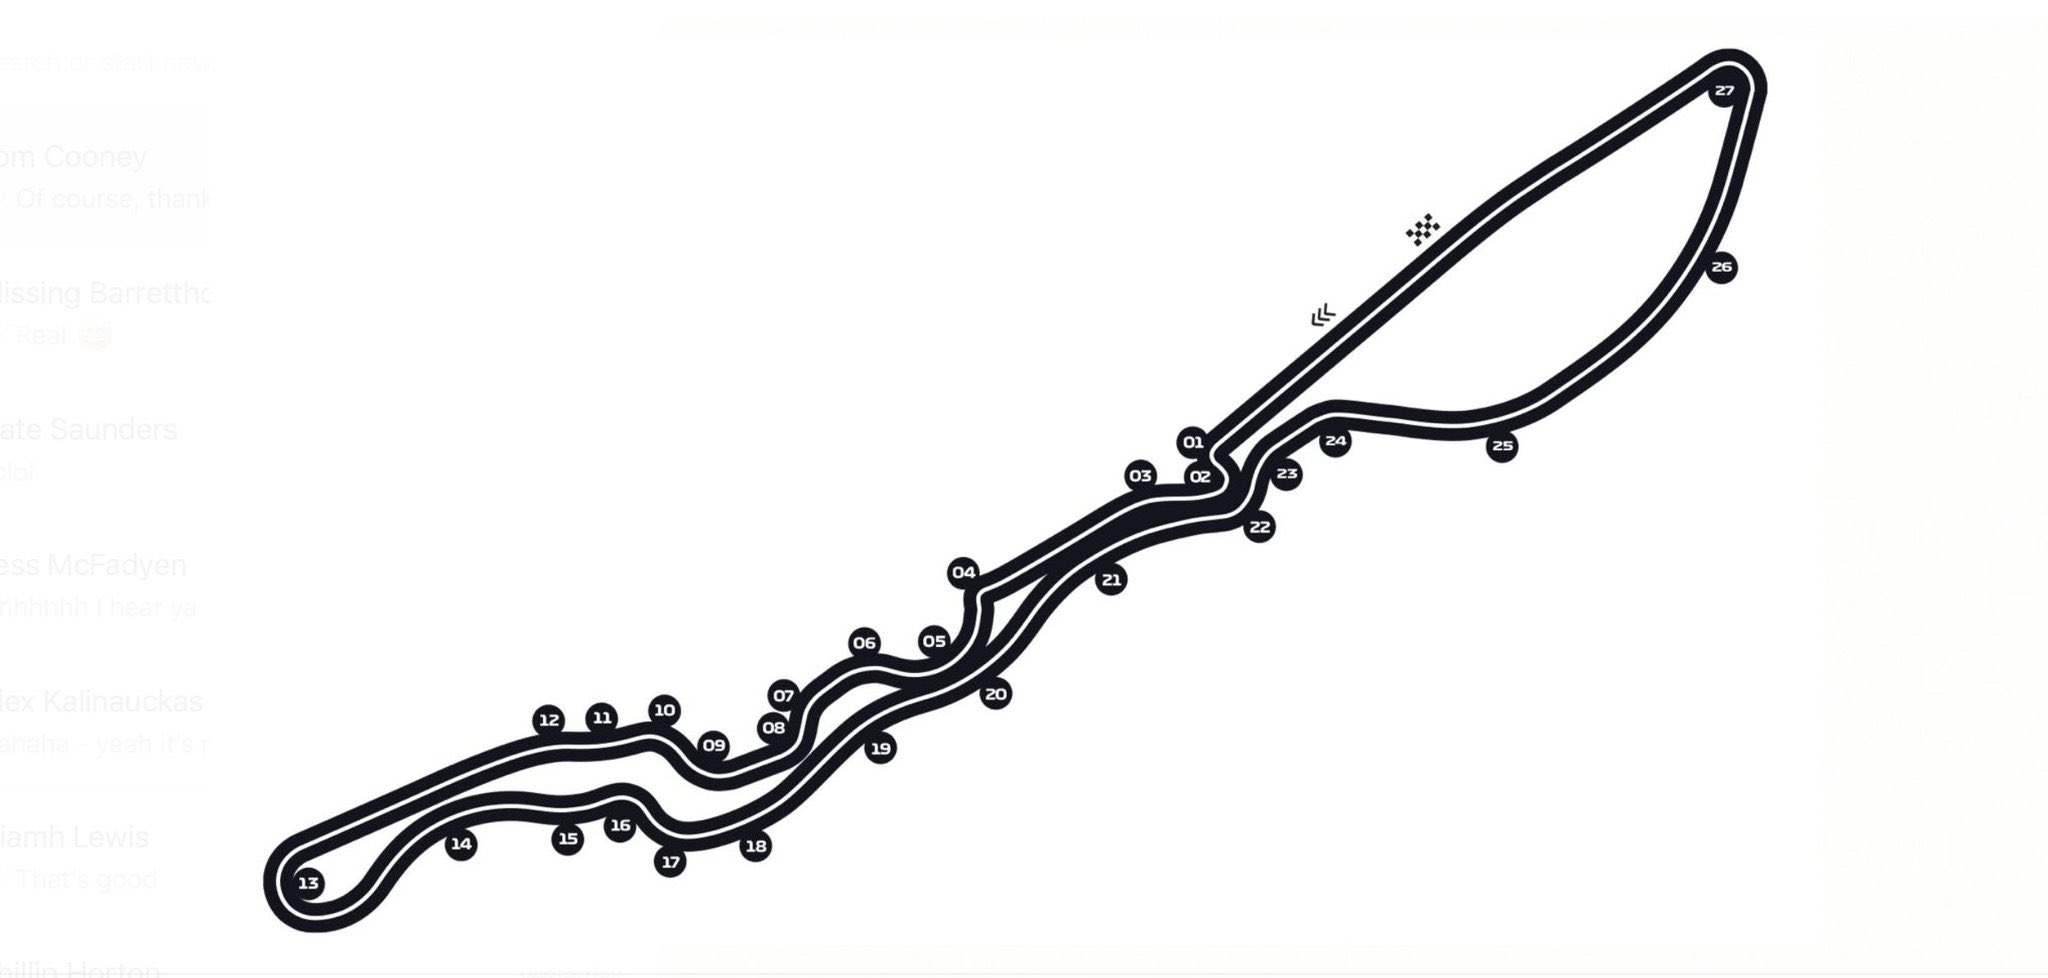 circuito-yeda-arabia-saudi-soymotor.jpg